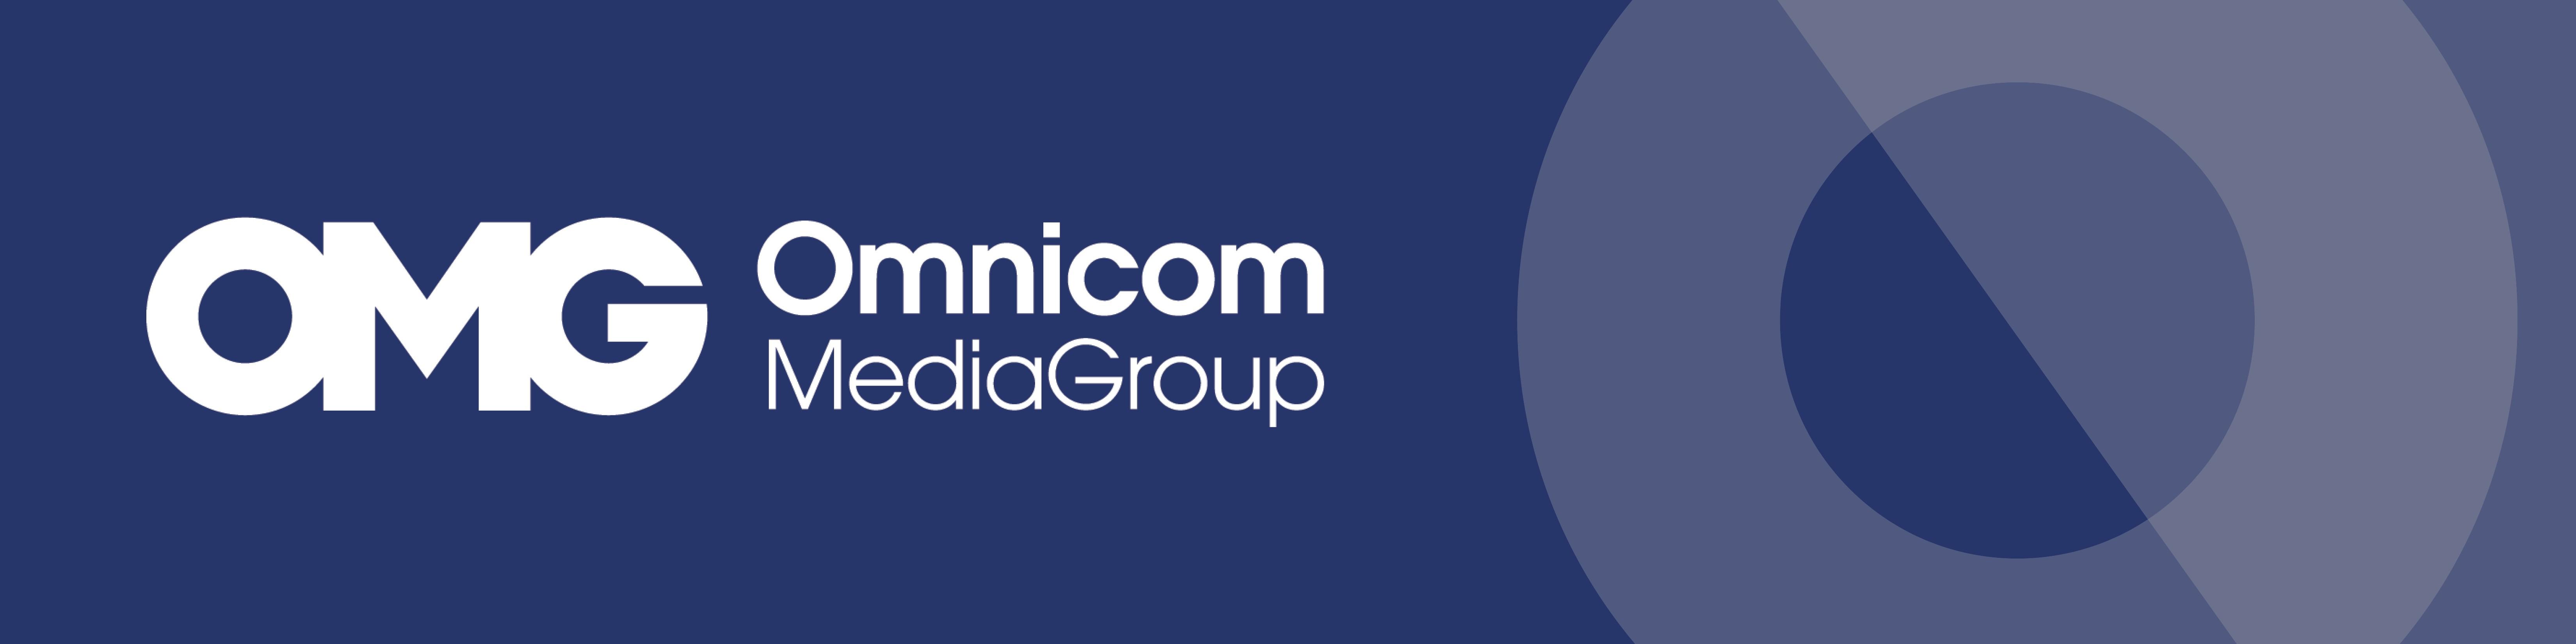 Omnicom Media Group   LinkedIn